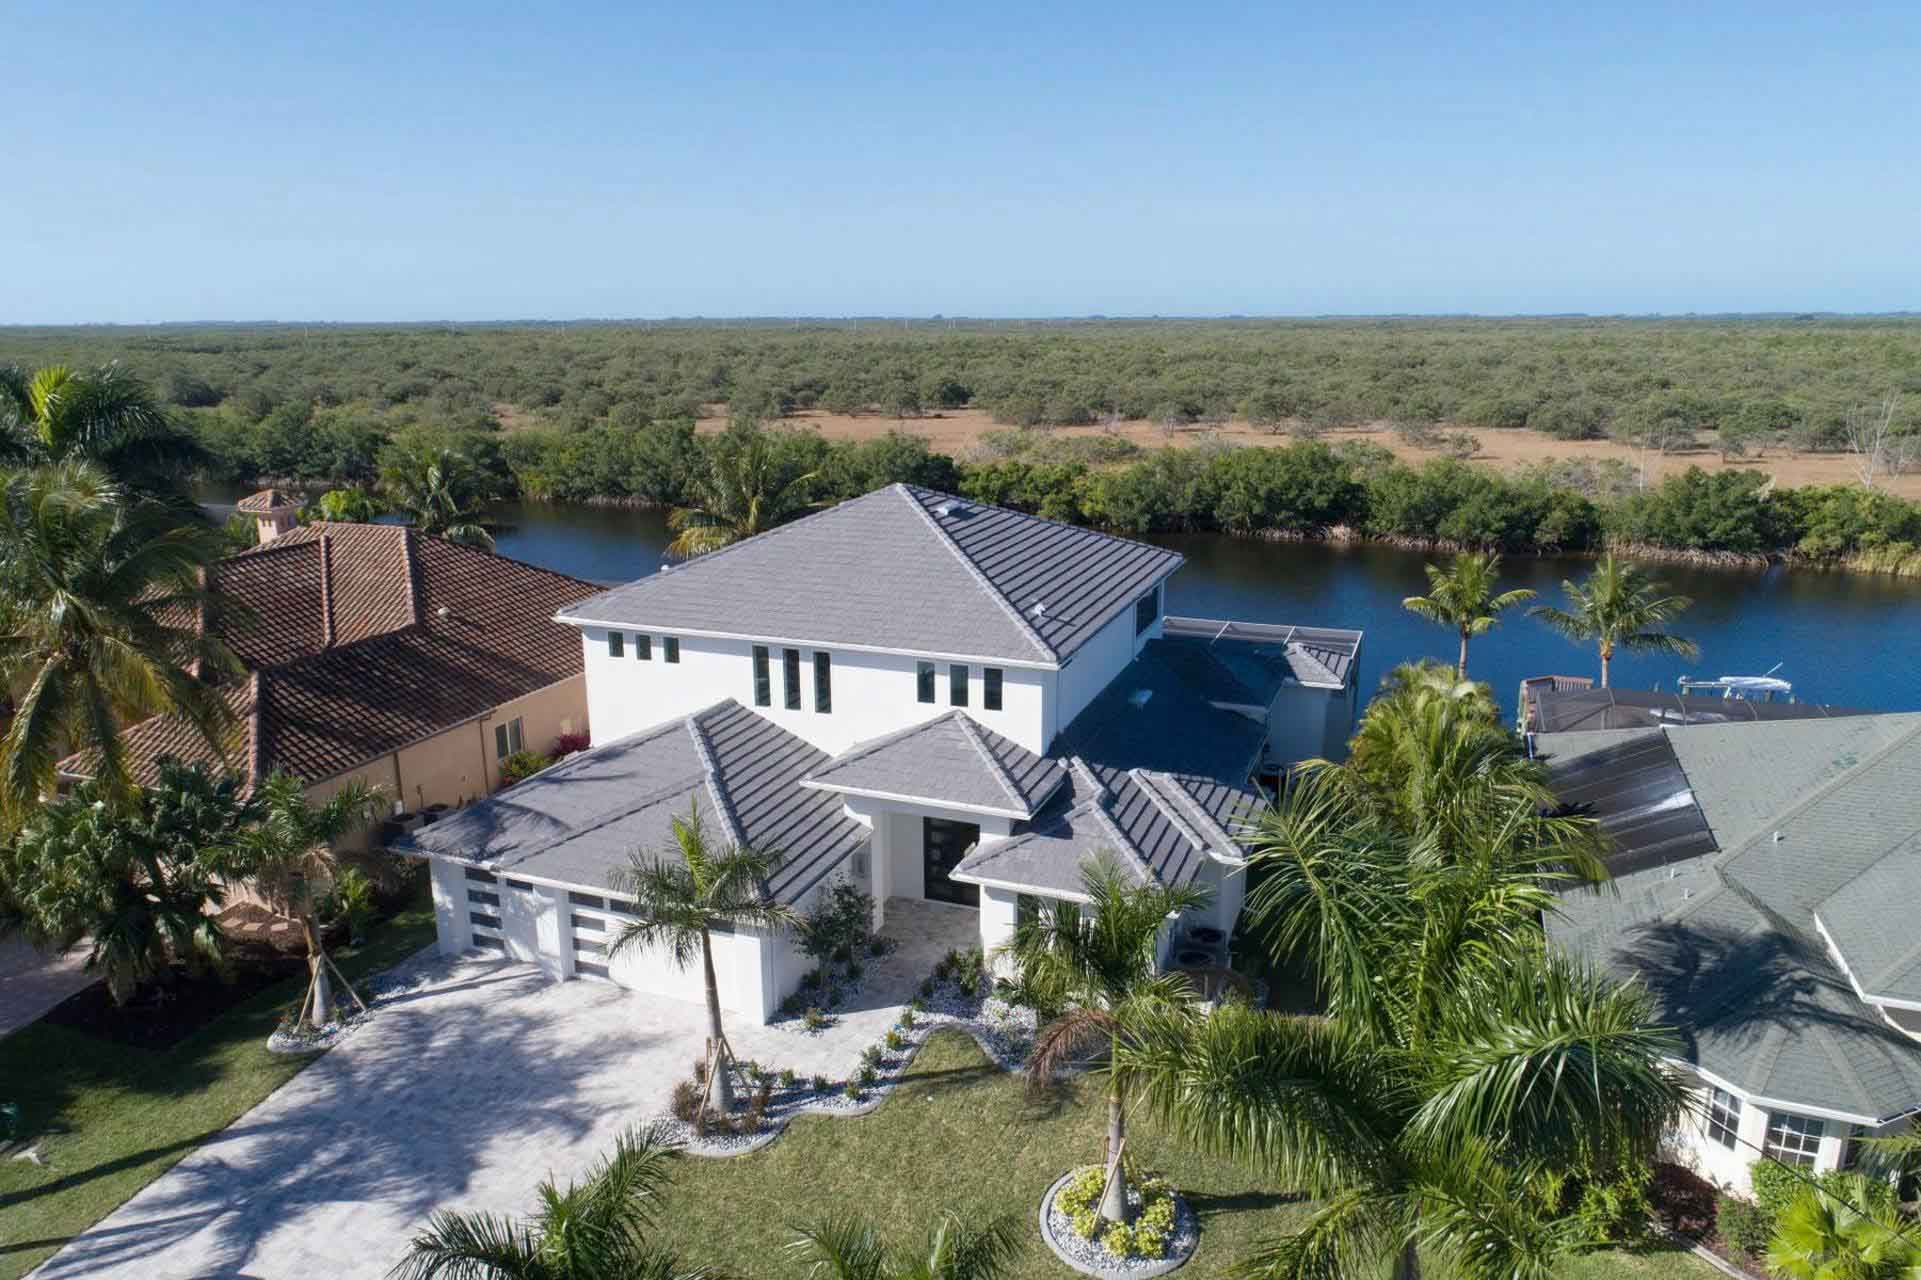 Blick auf Renditeimmobilien in Cape Coral